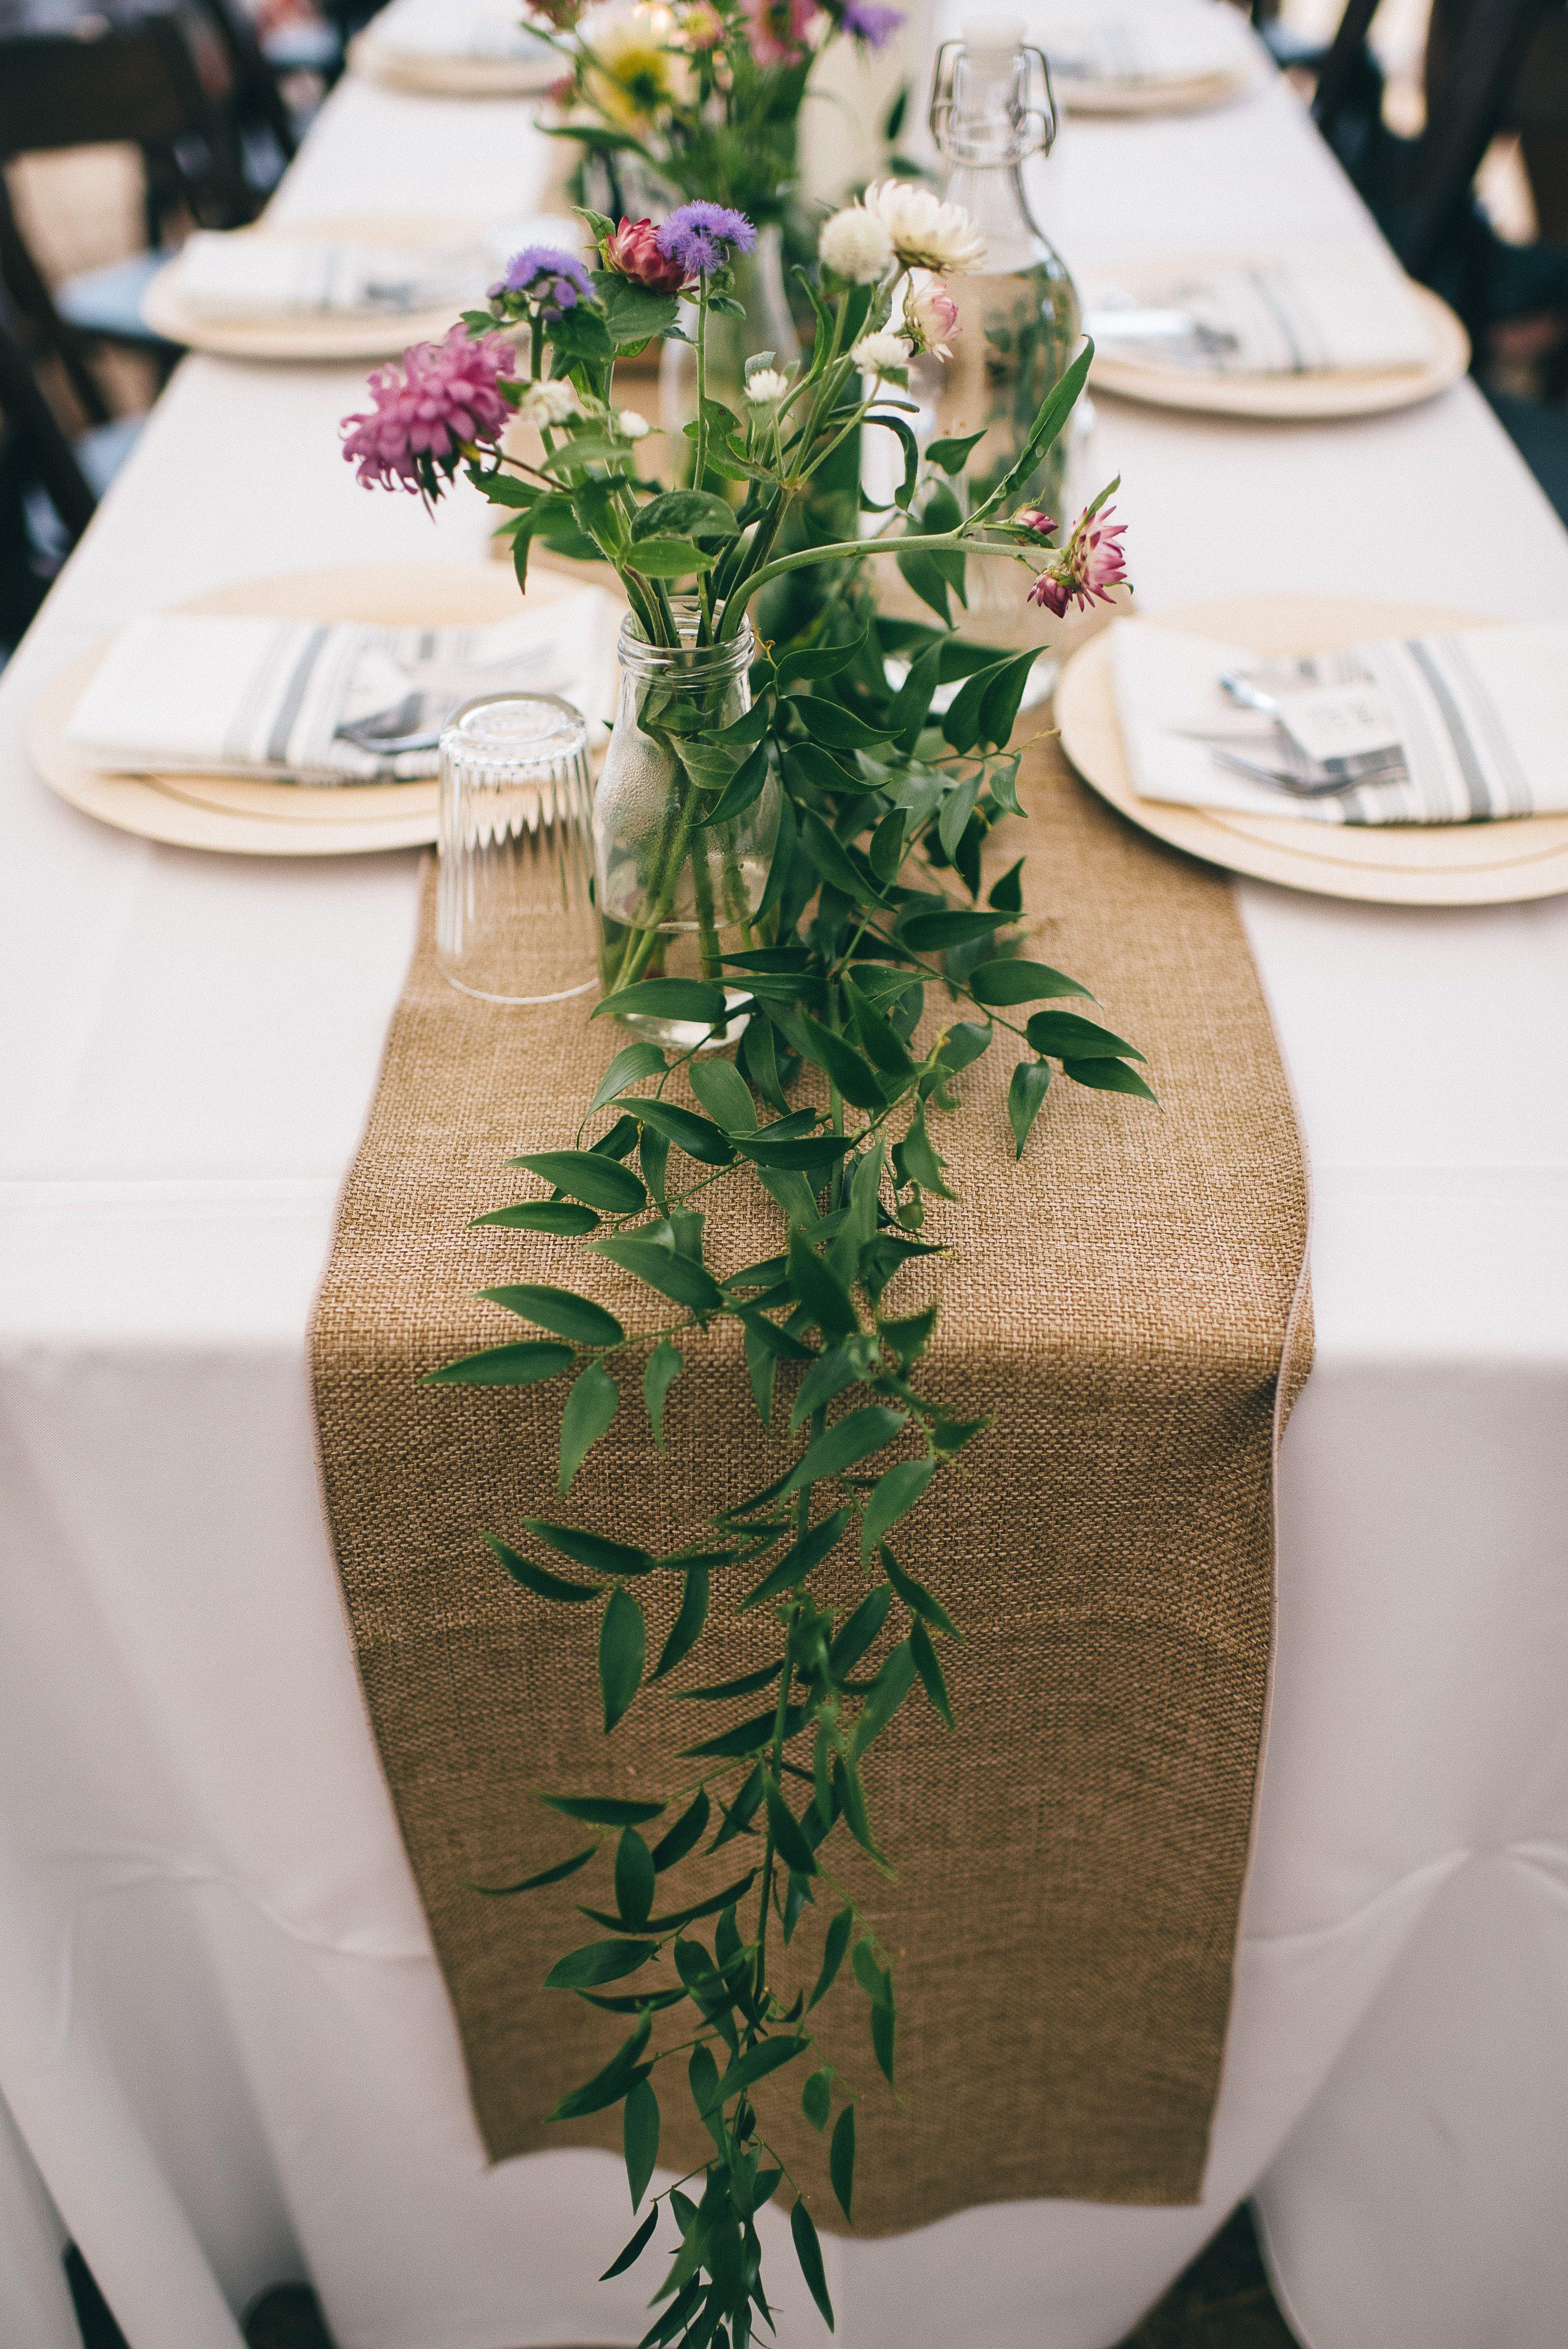 Farm Wedding Rustic Table Setting